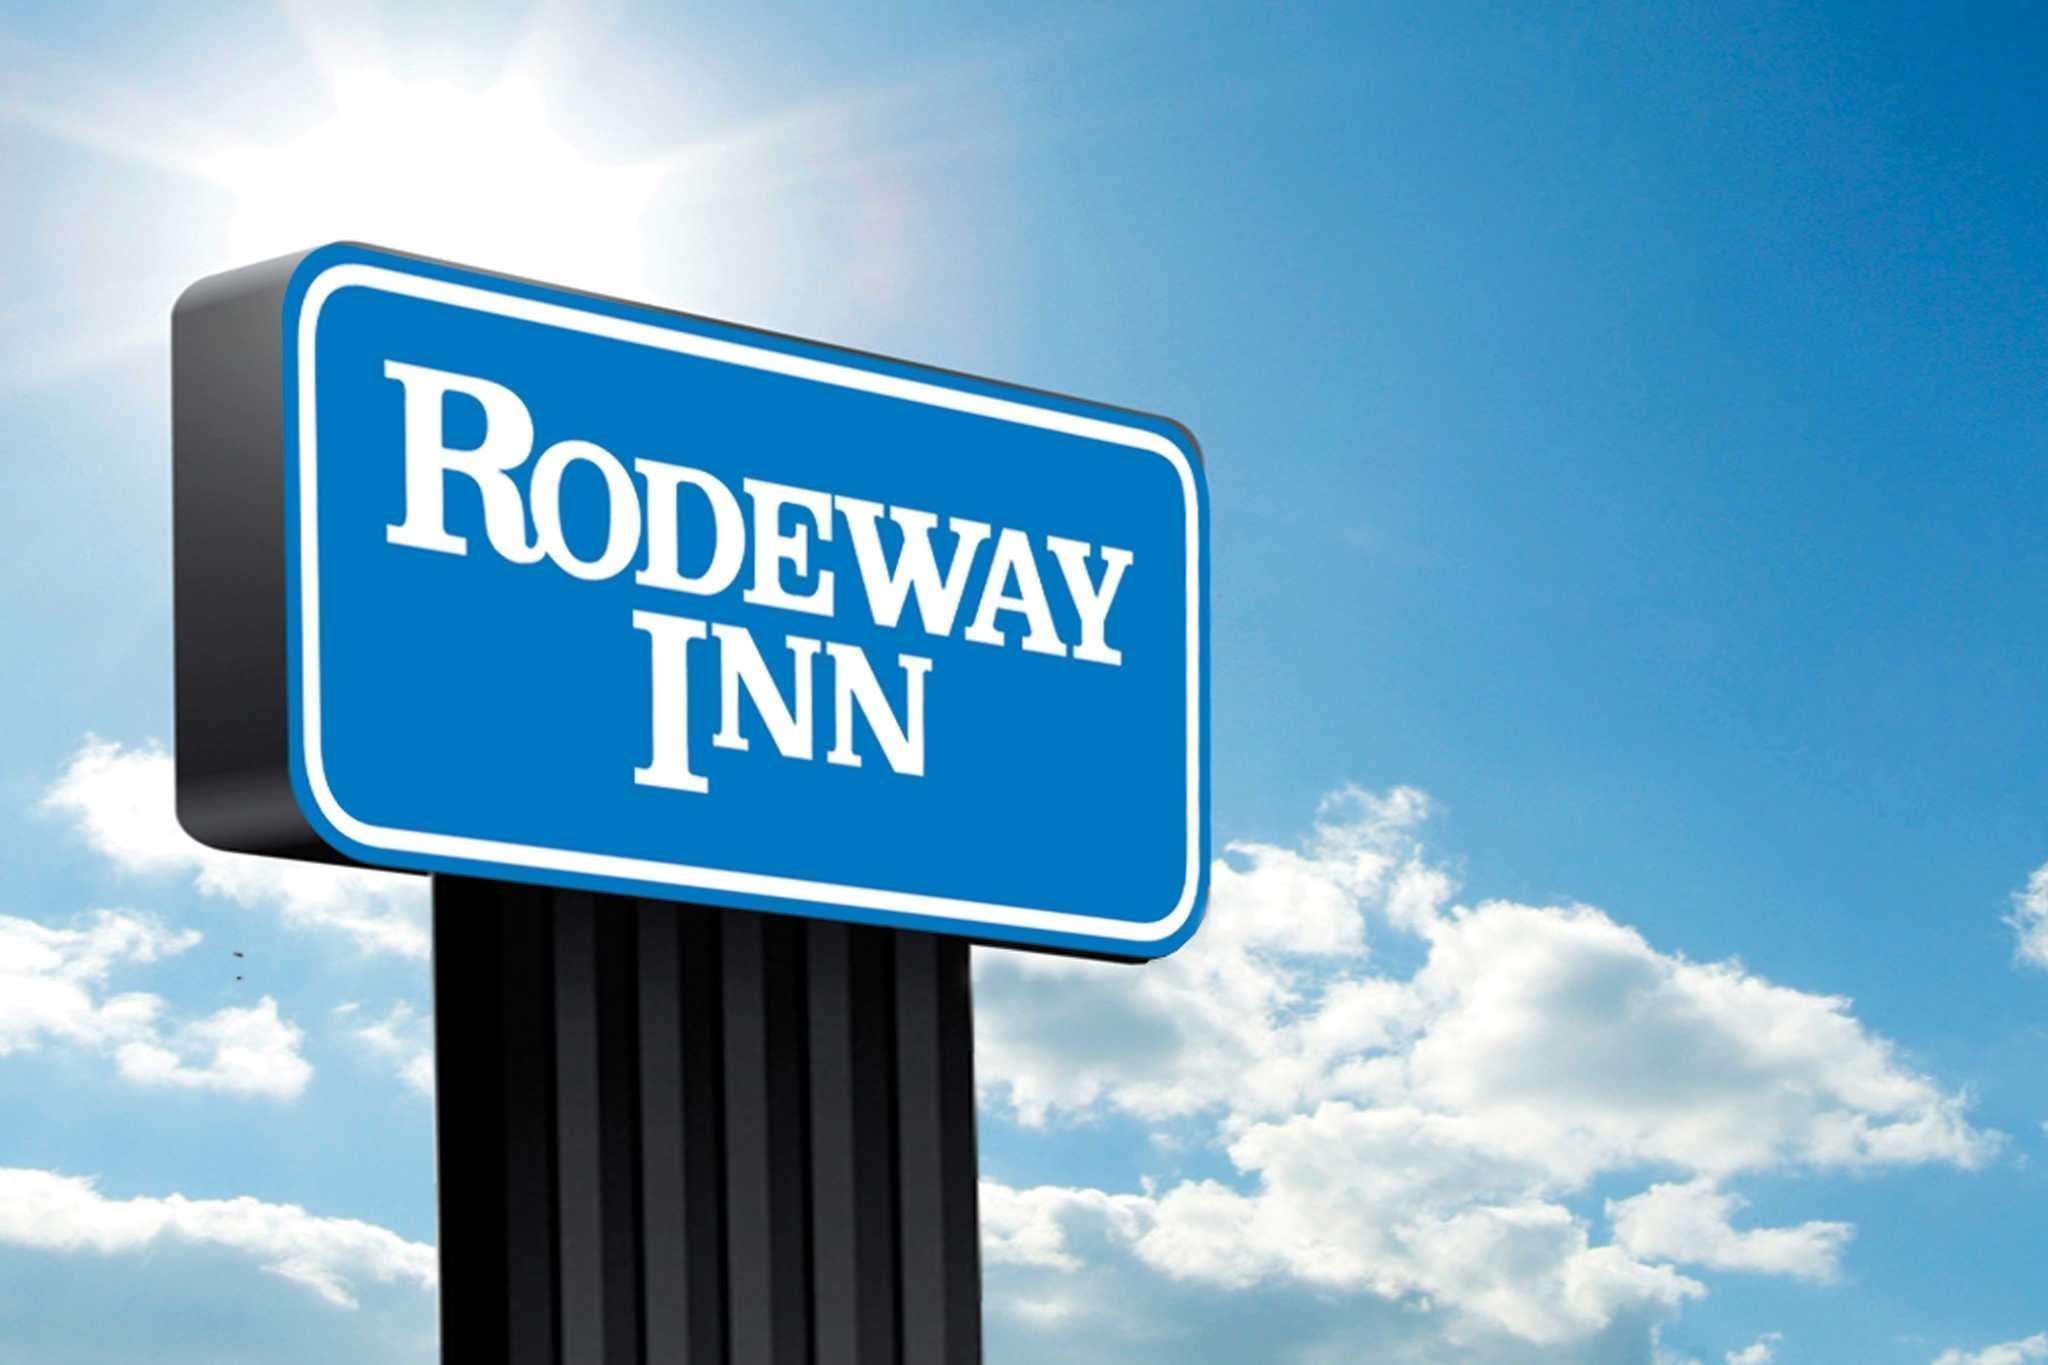 Rodeway Inn Osage Beach (MO) United States